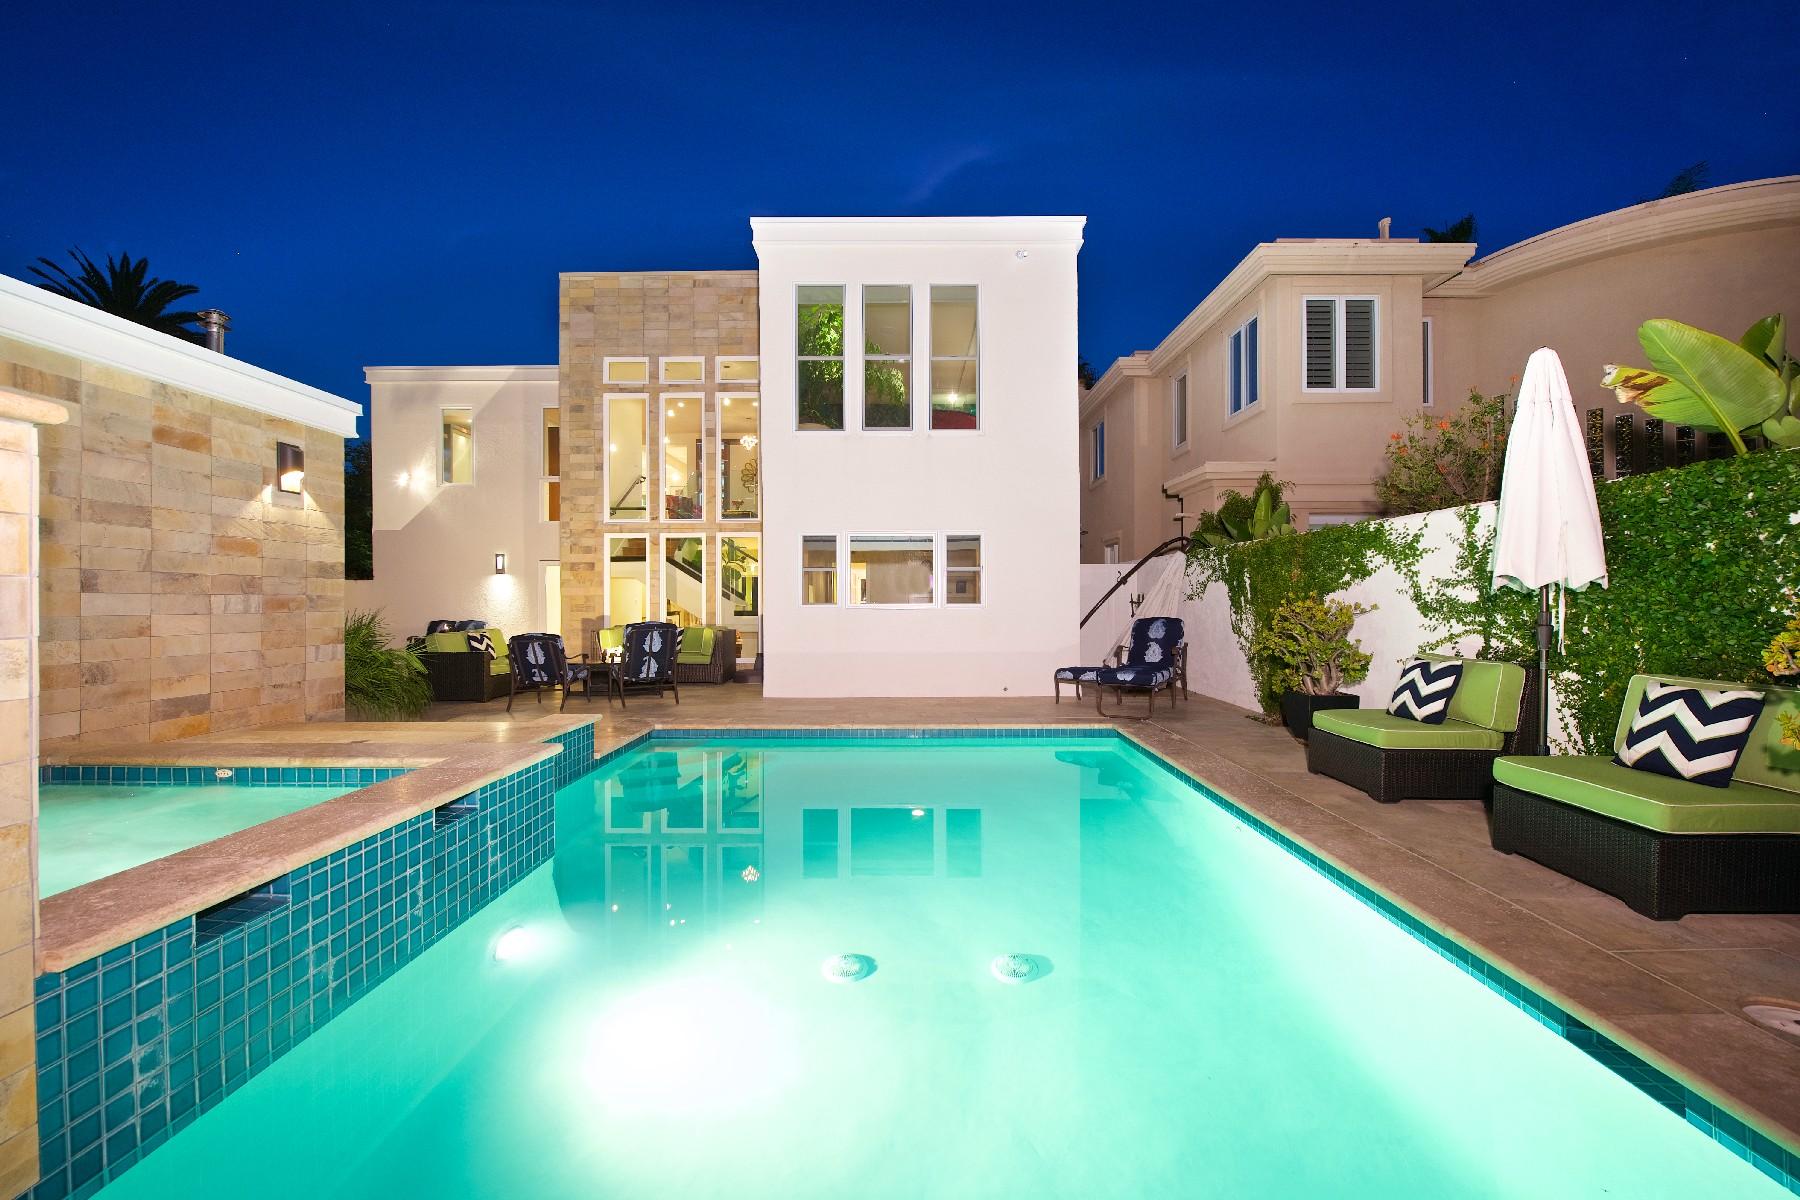 Property For Sale at 2312 Camino Del Collado